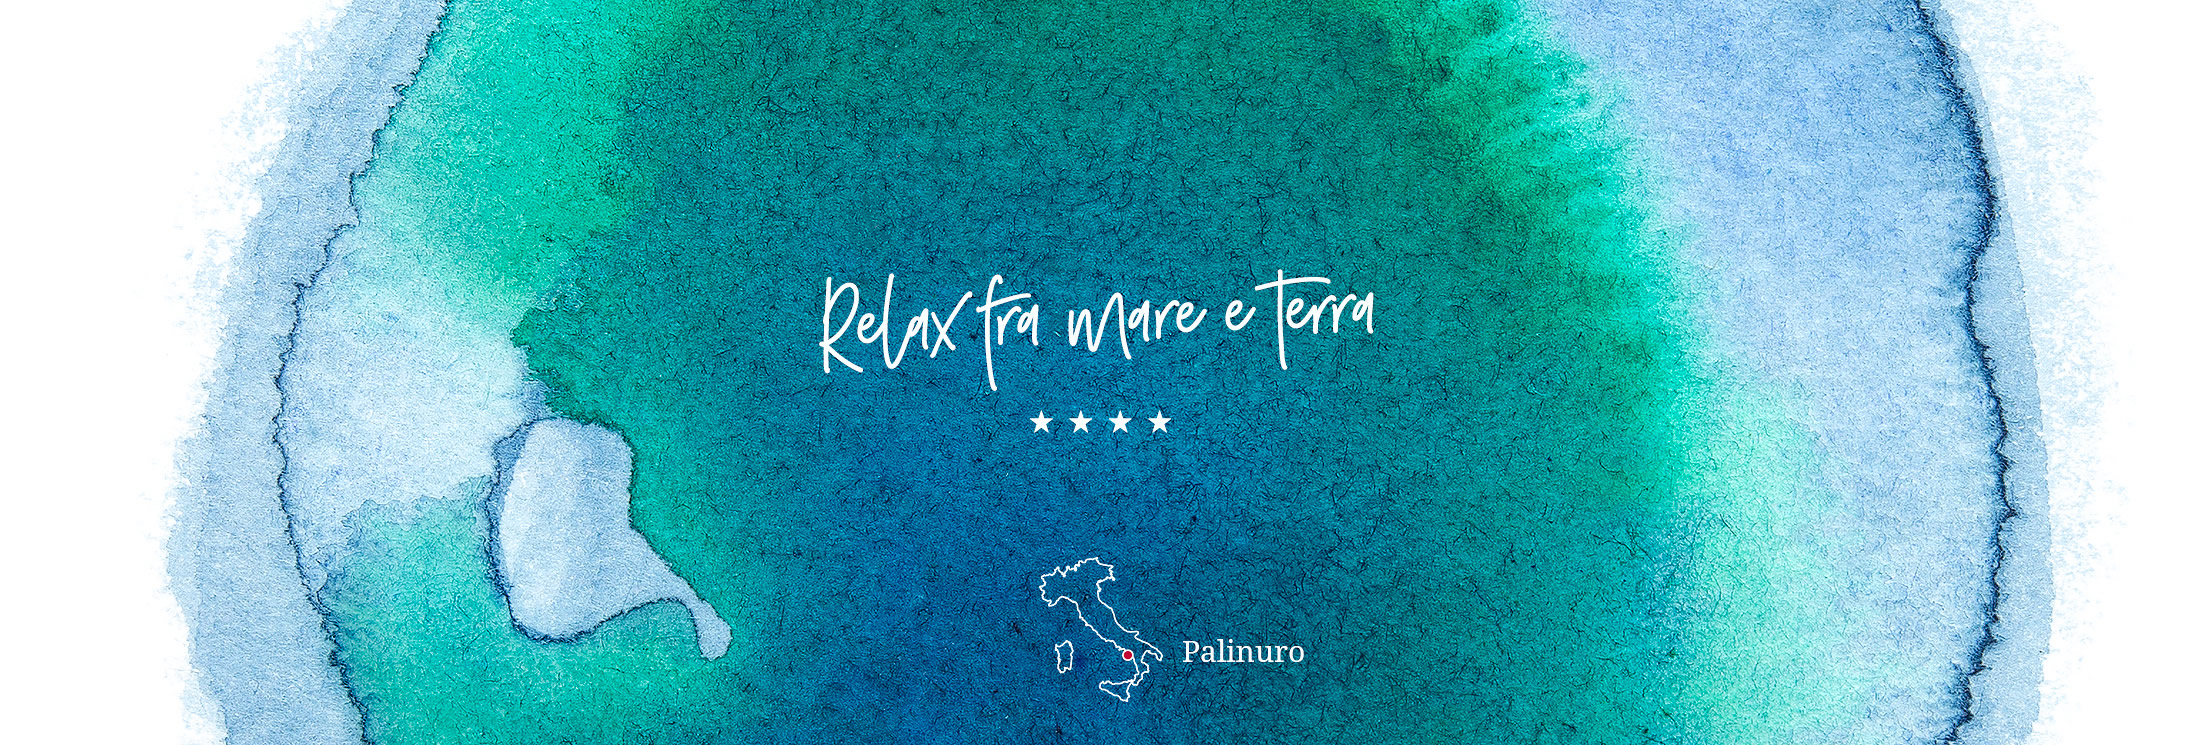 01-Slide-Palinuro-Resort-Baia-del-Silenzio